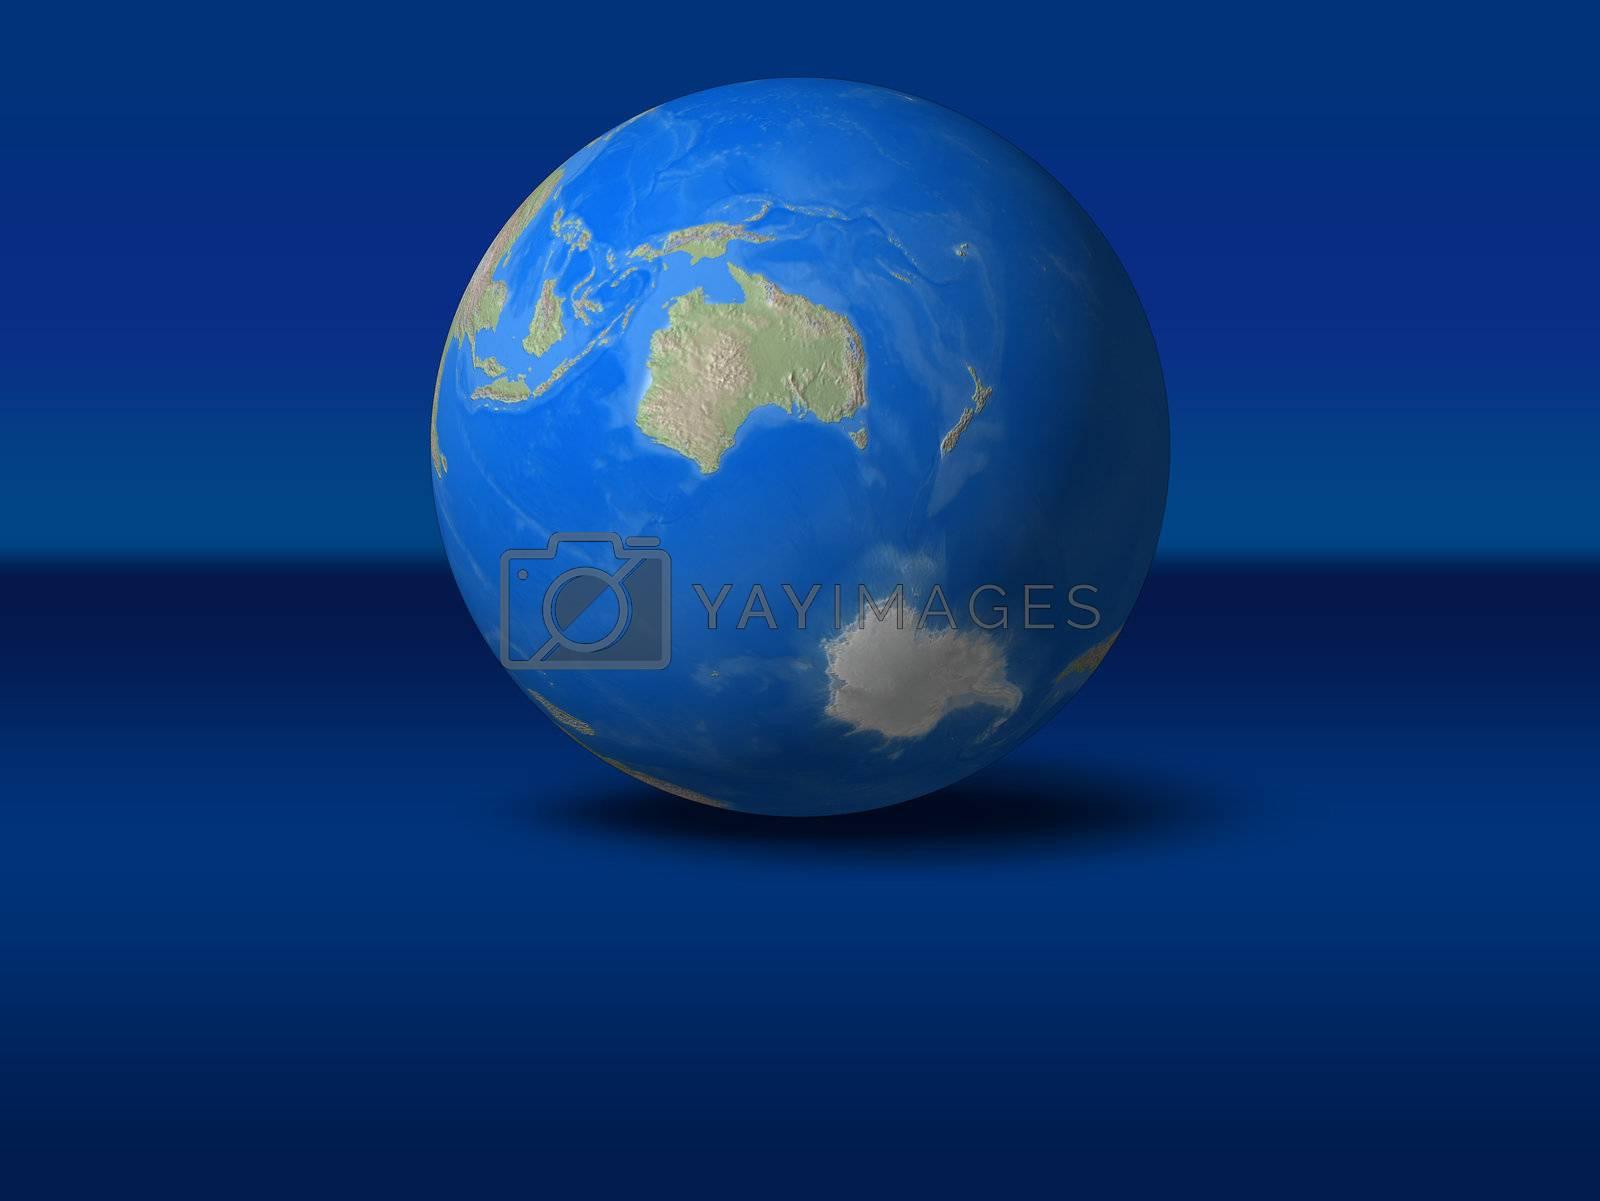 World Globe on blue graphic background Australia view